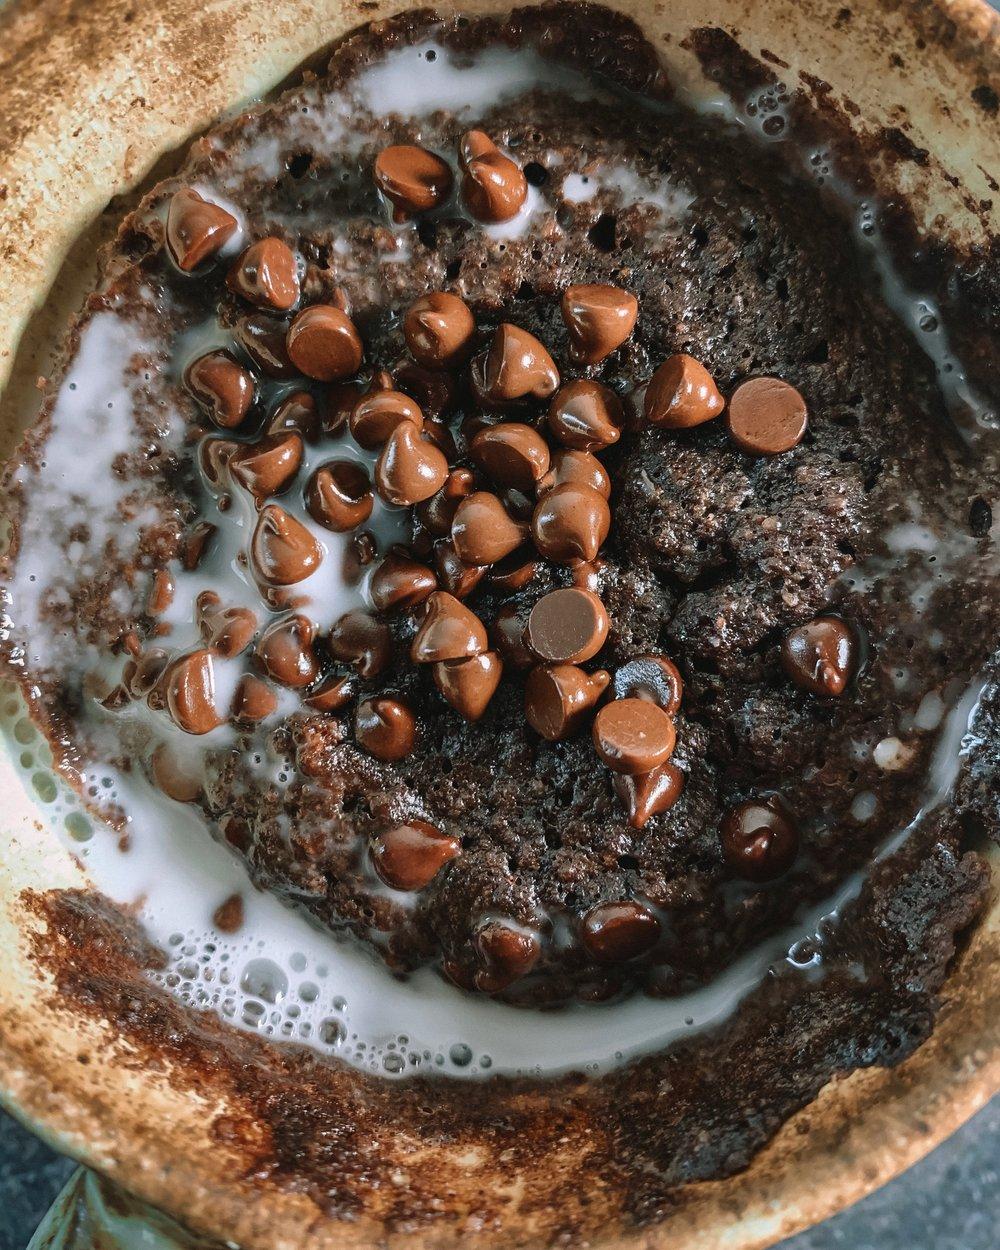 PALEO MUG BROWNIE CAKE - 4 tb almond flour 2 tb cacao powder2 tb coconut sugar1 egg2 tb almond milkpinch of saltdairy free chocolate chips